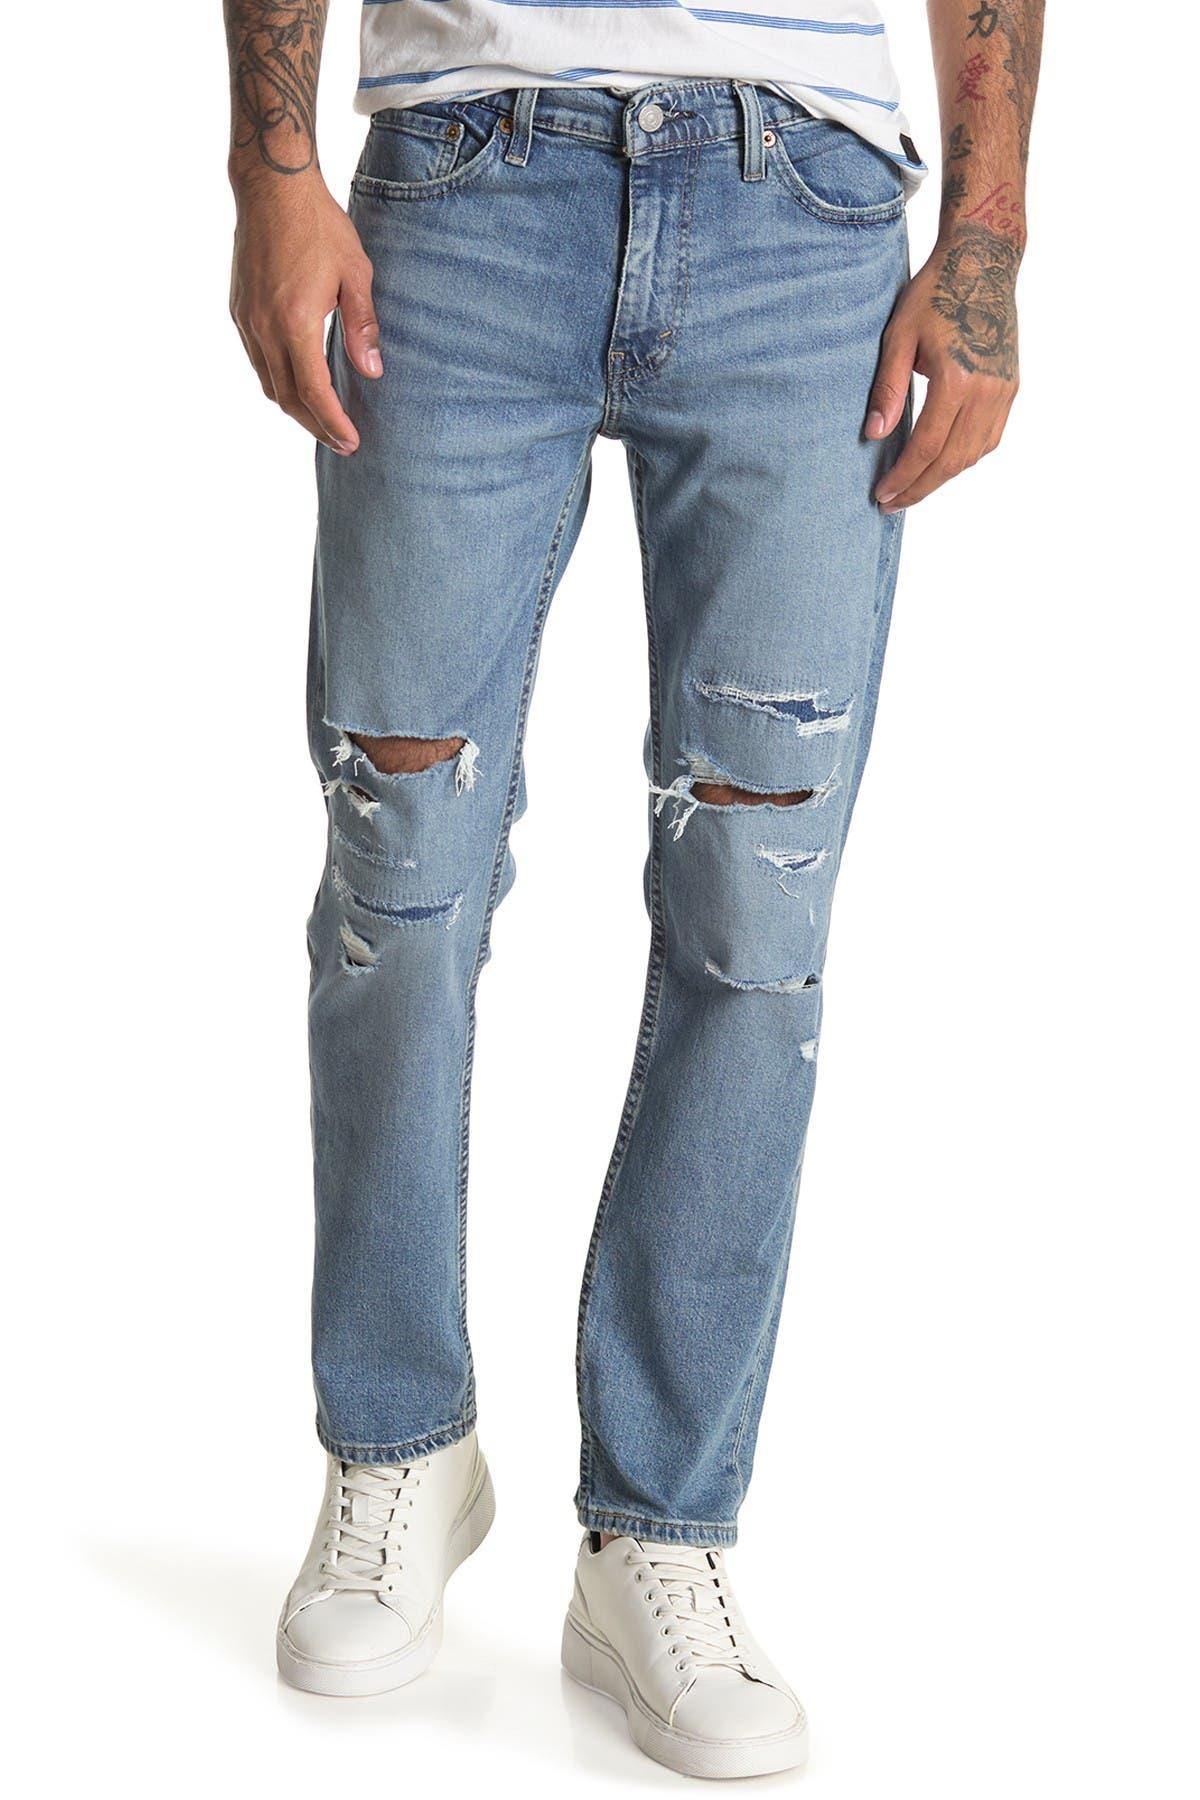 "Image of Levi's 511 Distressed Slim Jeans - 30-32"" Inseam"